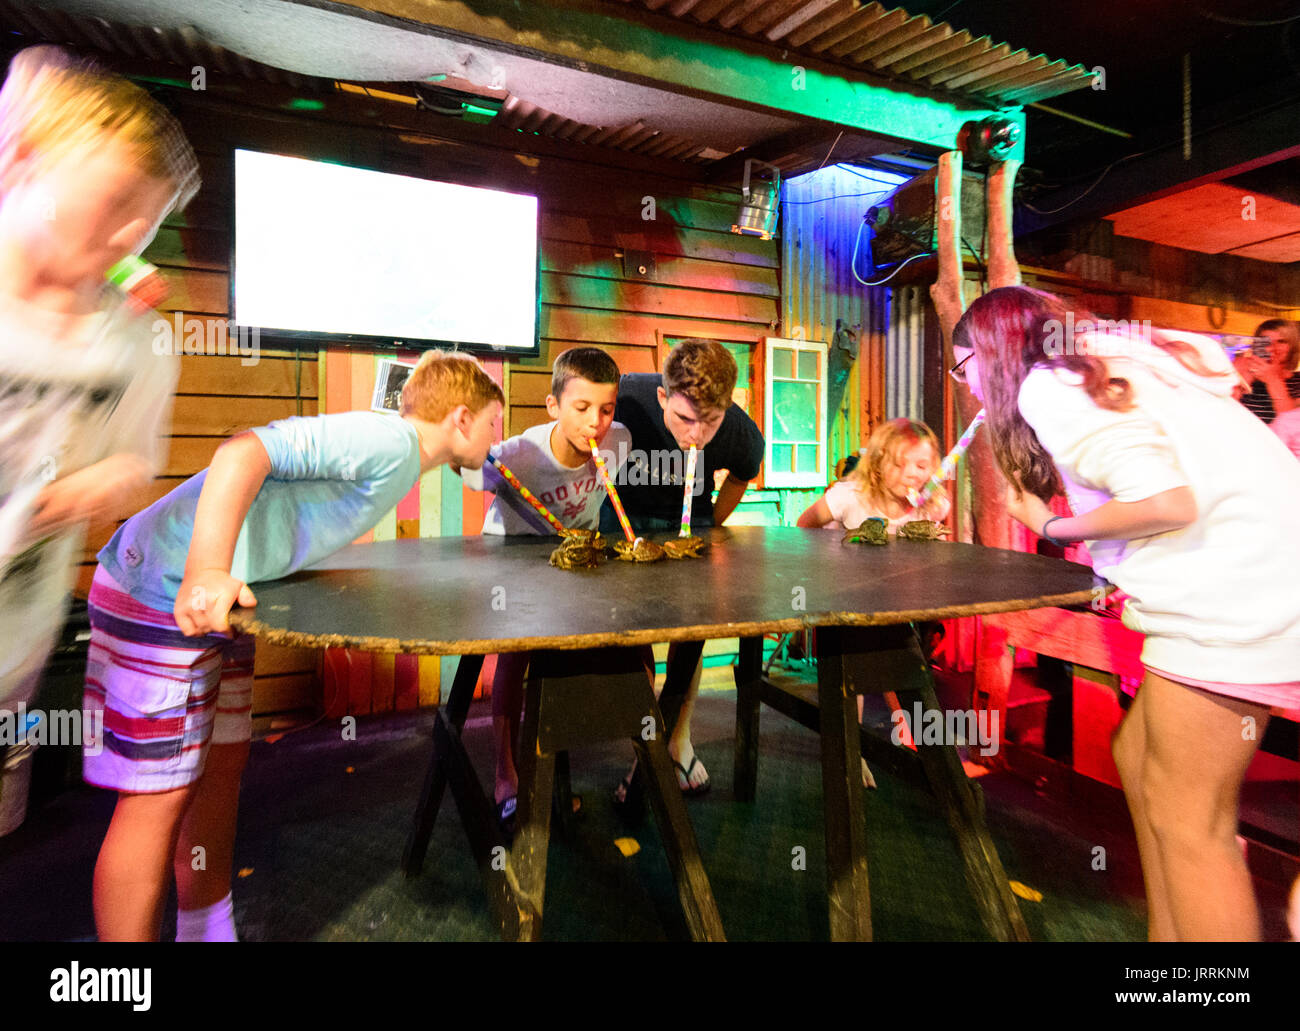 Cane Toad Racing evening at the Iron Bar restaurant, Macrossan Street, Port Douglas, Far North Queensland, FNQ, QLD, Australia - Stock Image